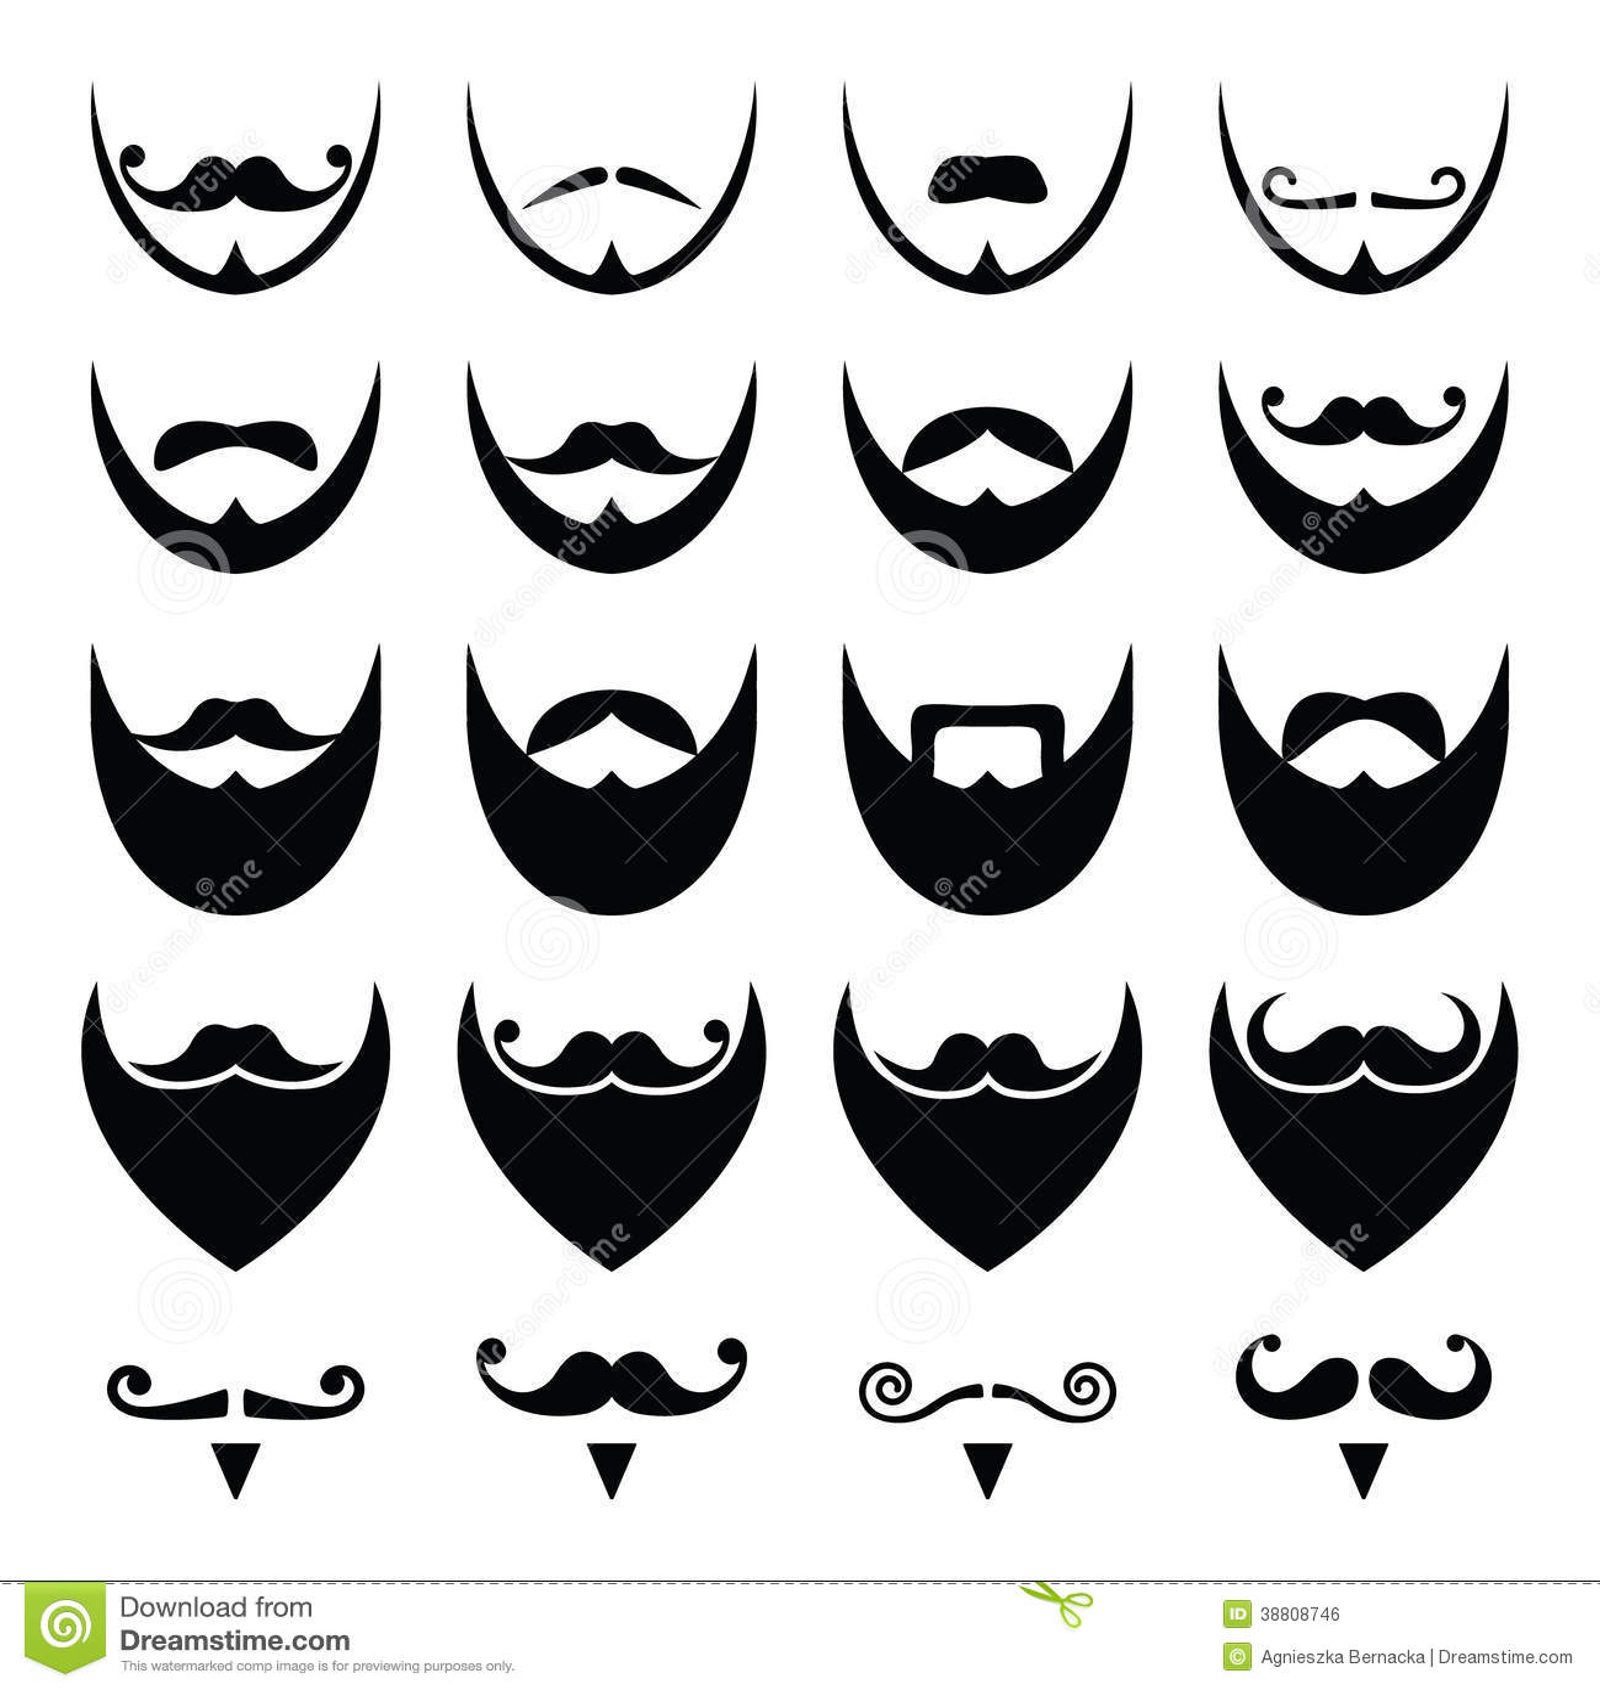 Peachy Beard With Moustache Or Mustache Icons Set Stock Illustration Short Hairstyles Gunalazisus